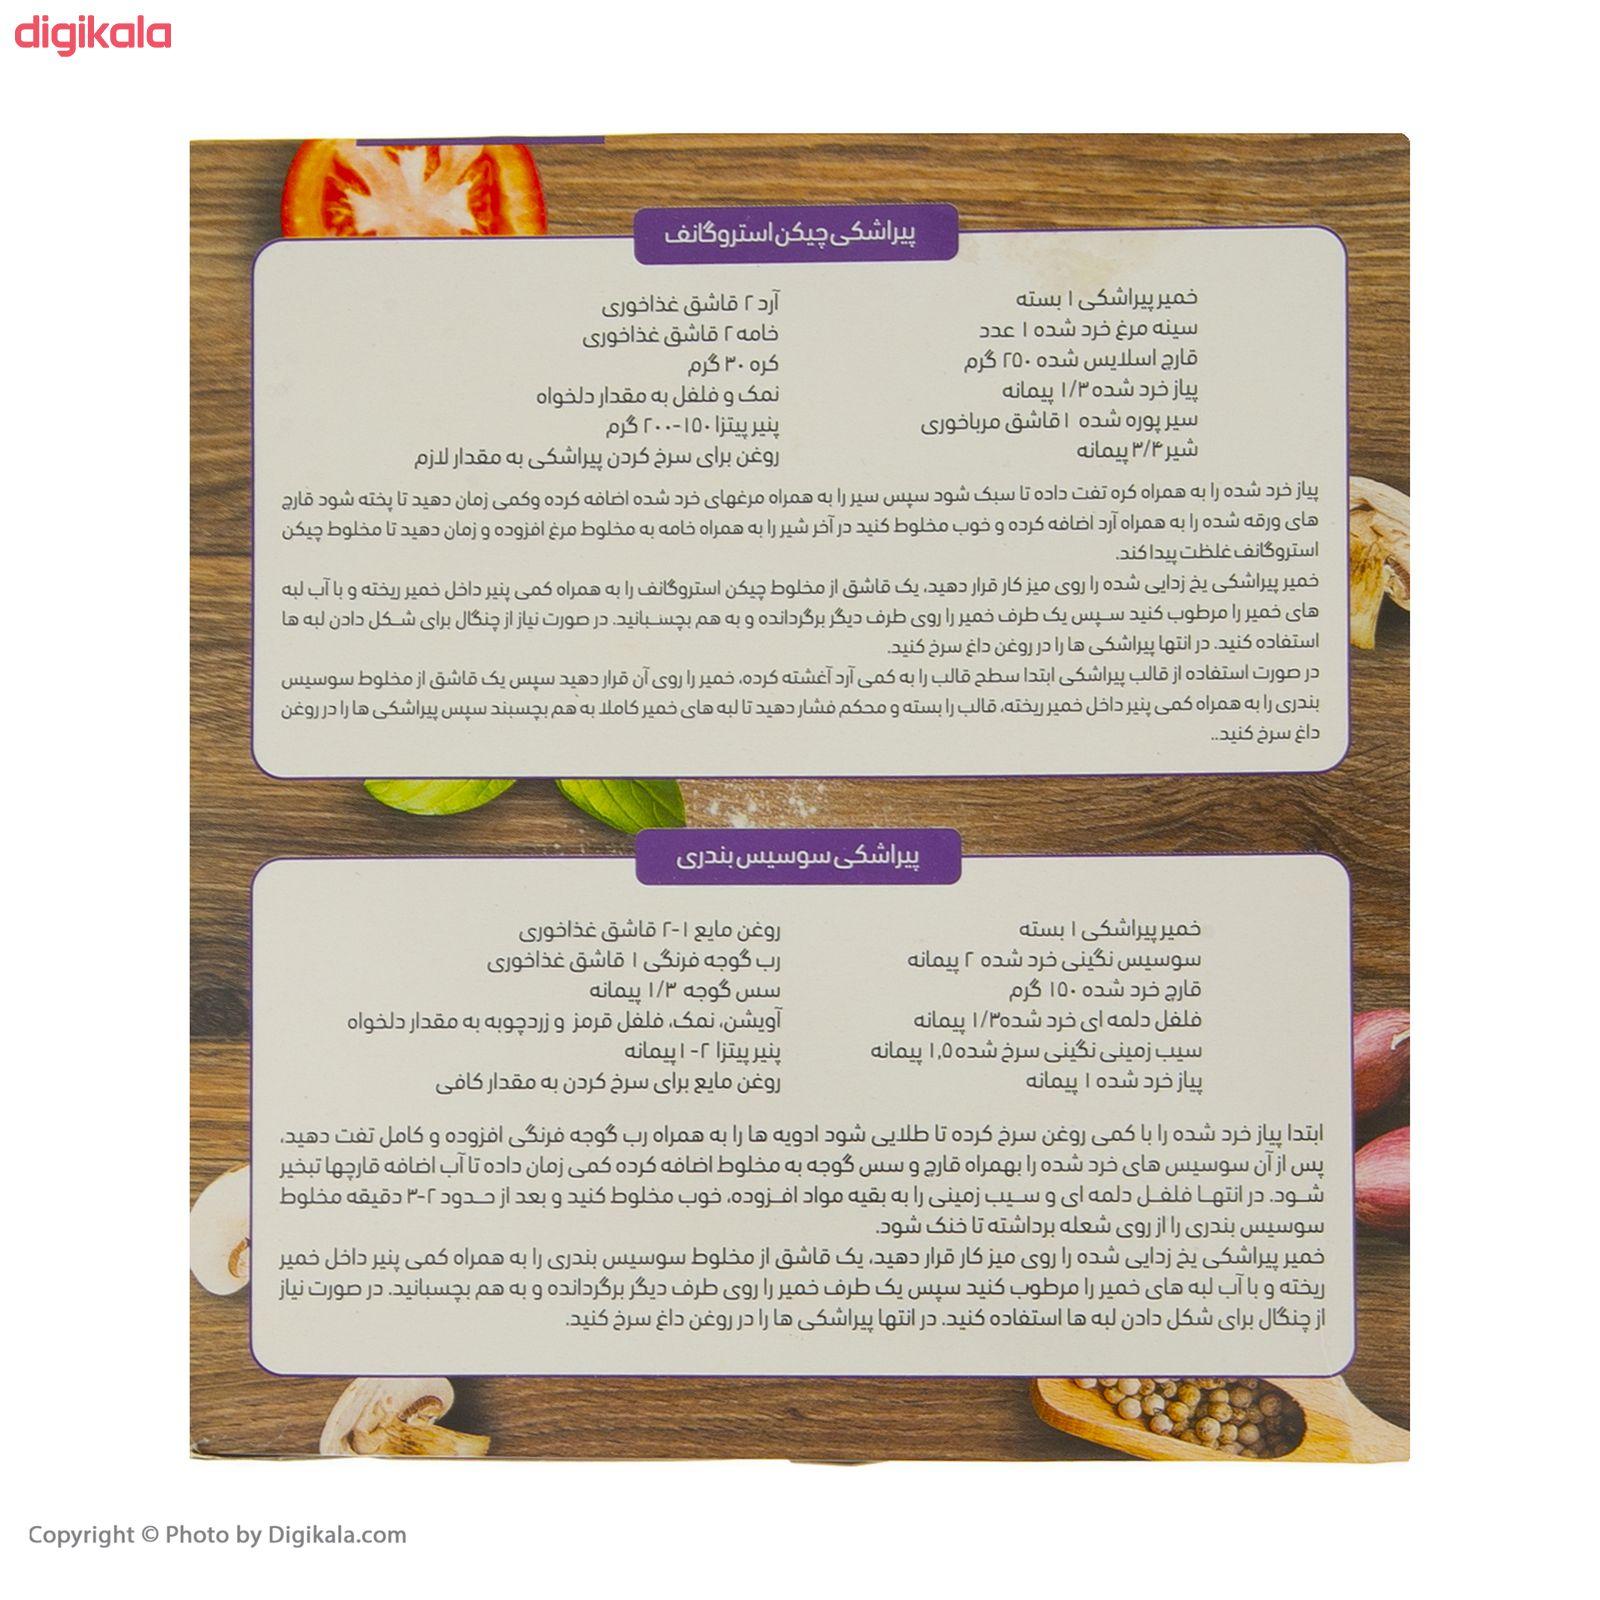 خمیر پیراشکی منجمد پمینا - 500 گرم main 1 2